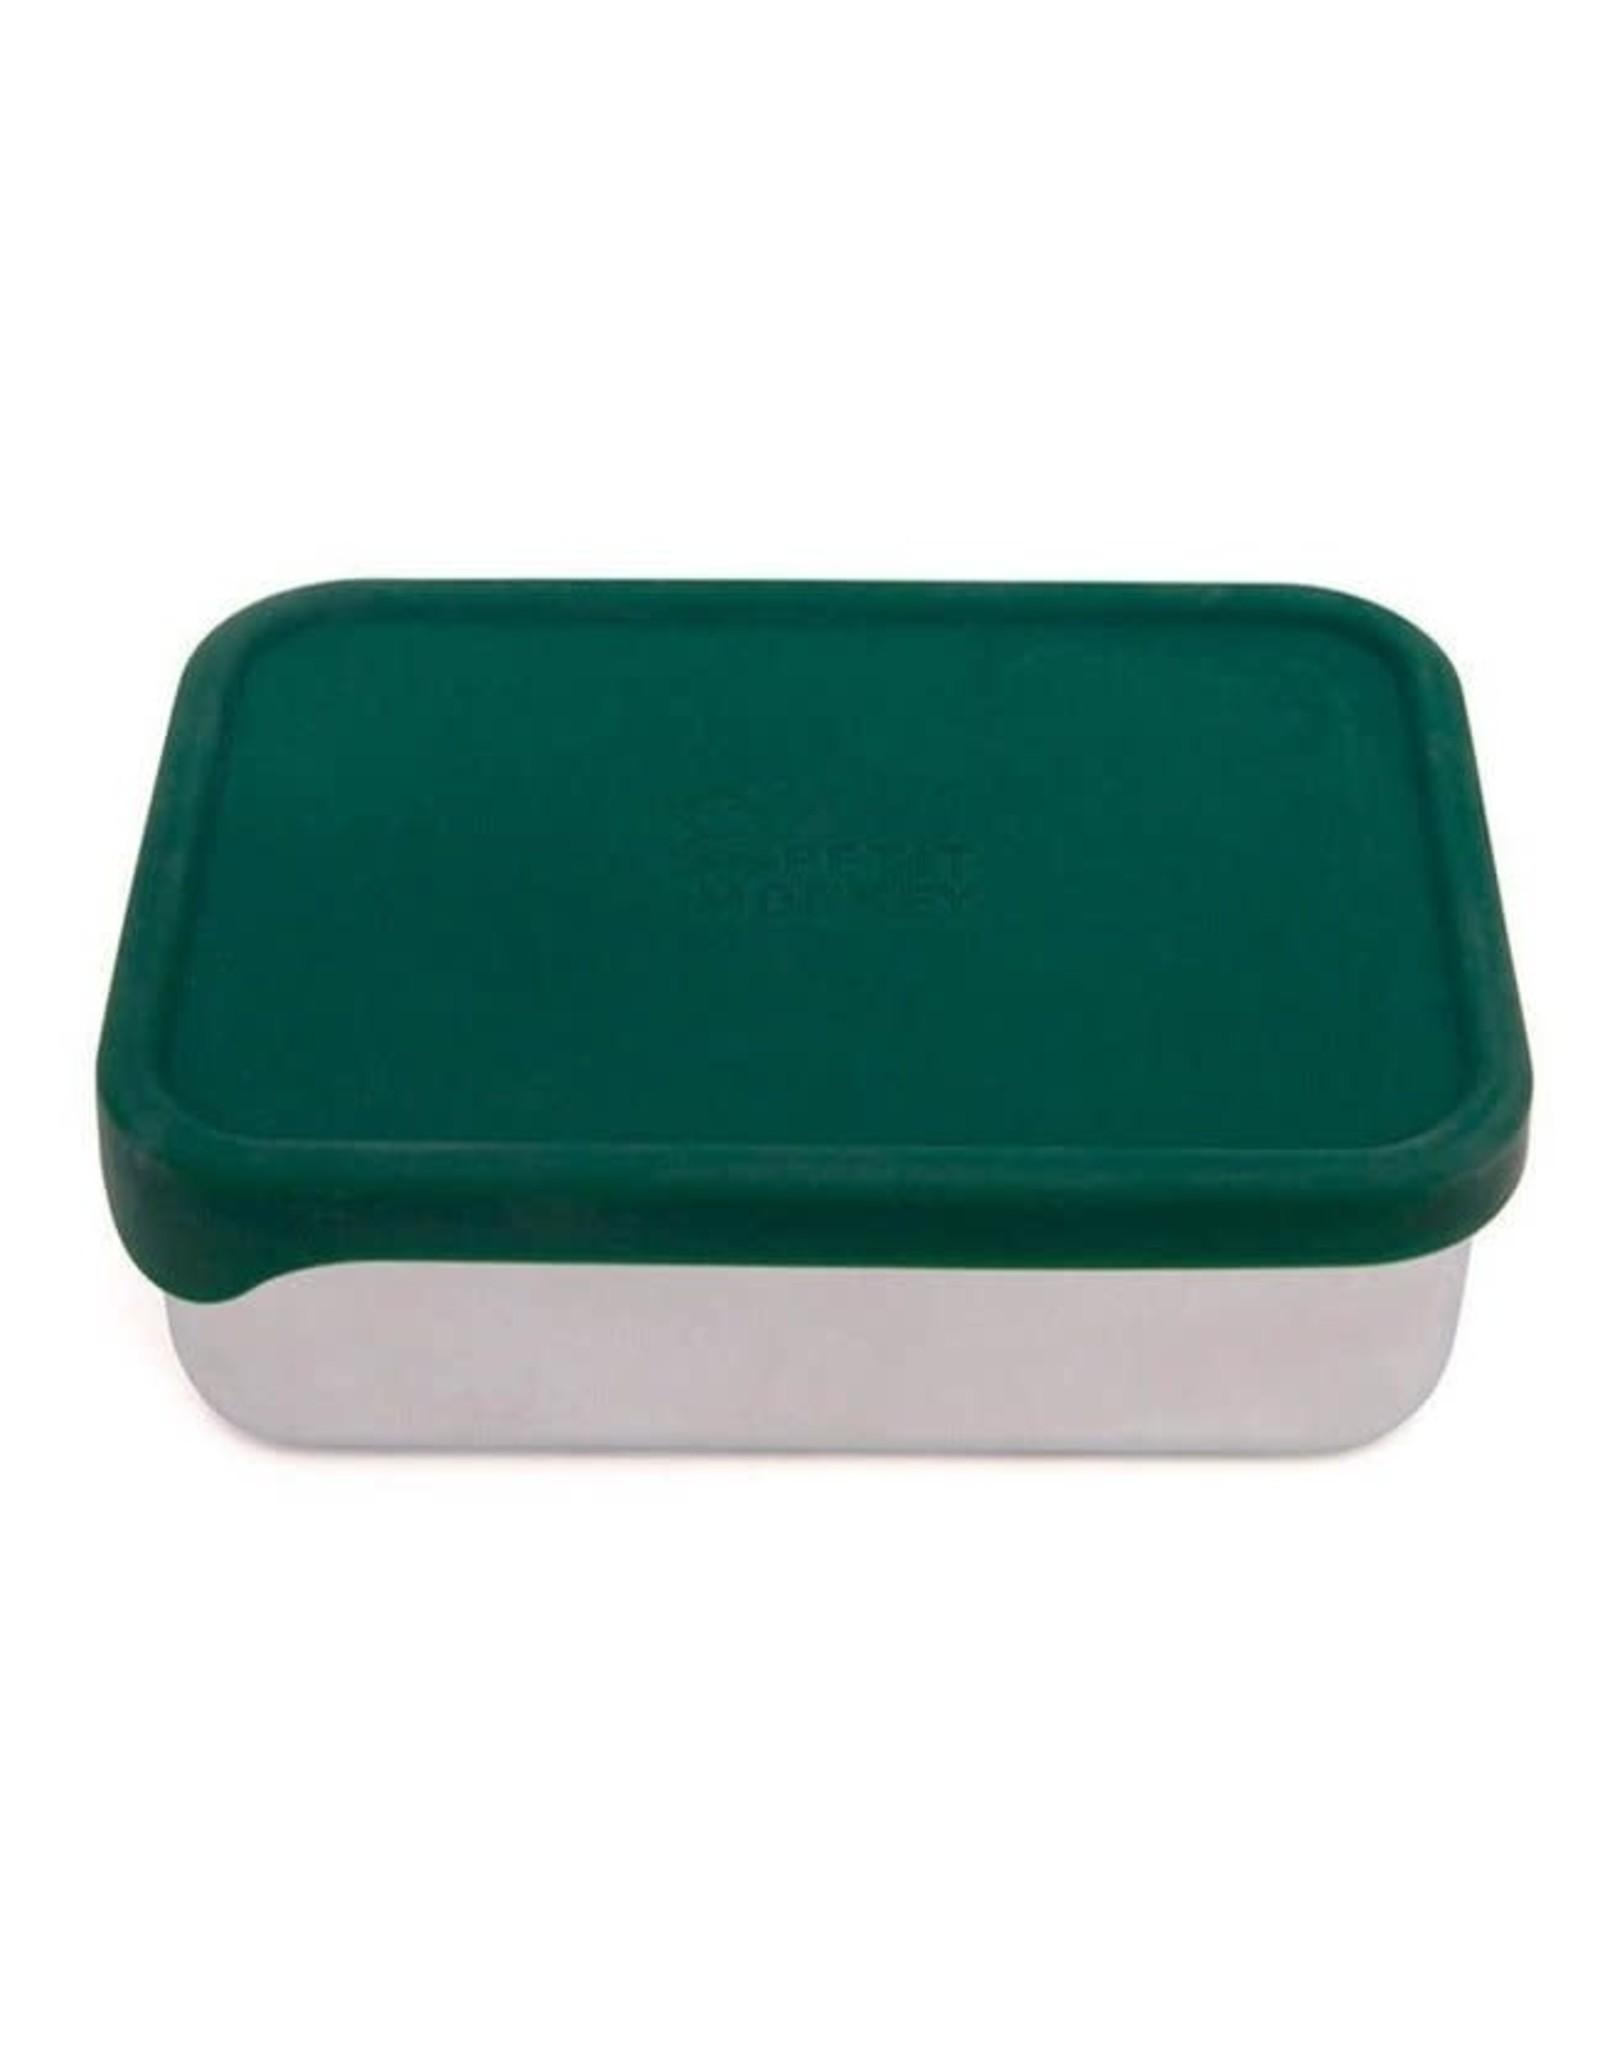 Petit Monkey stainless steel lunchbox pine green